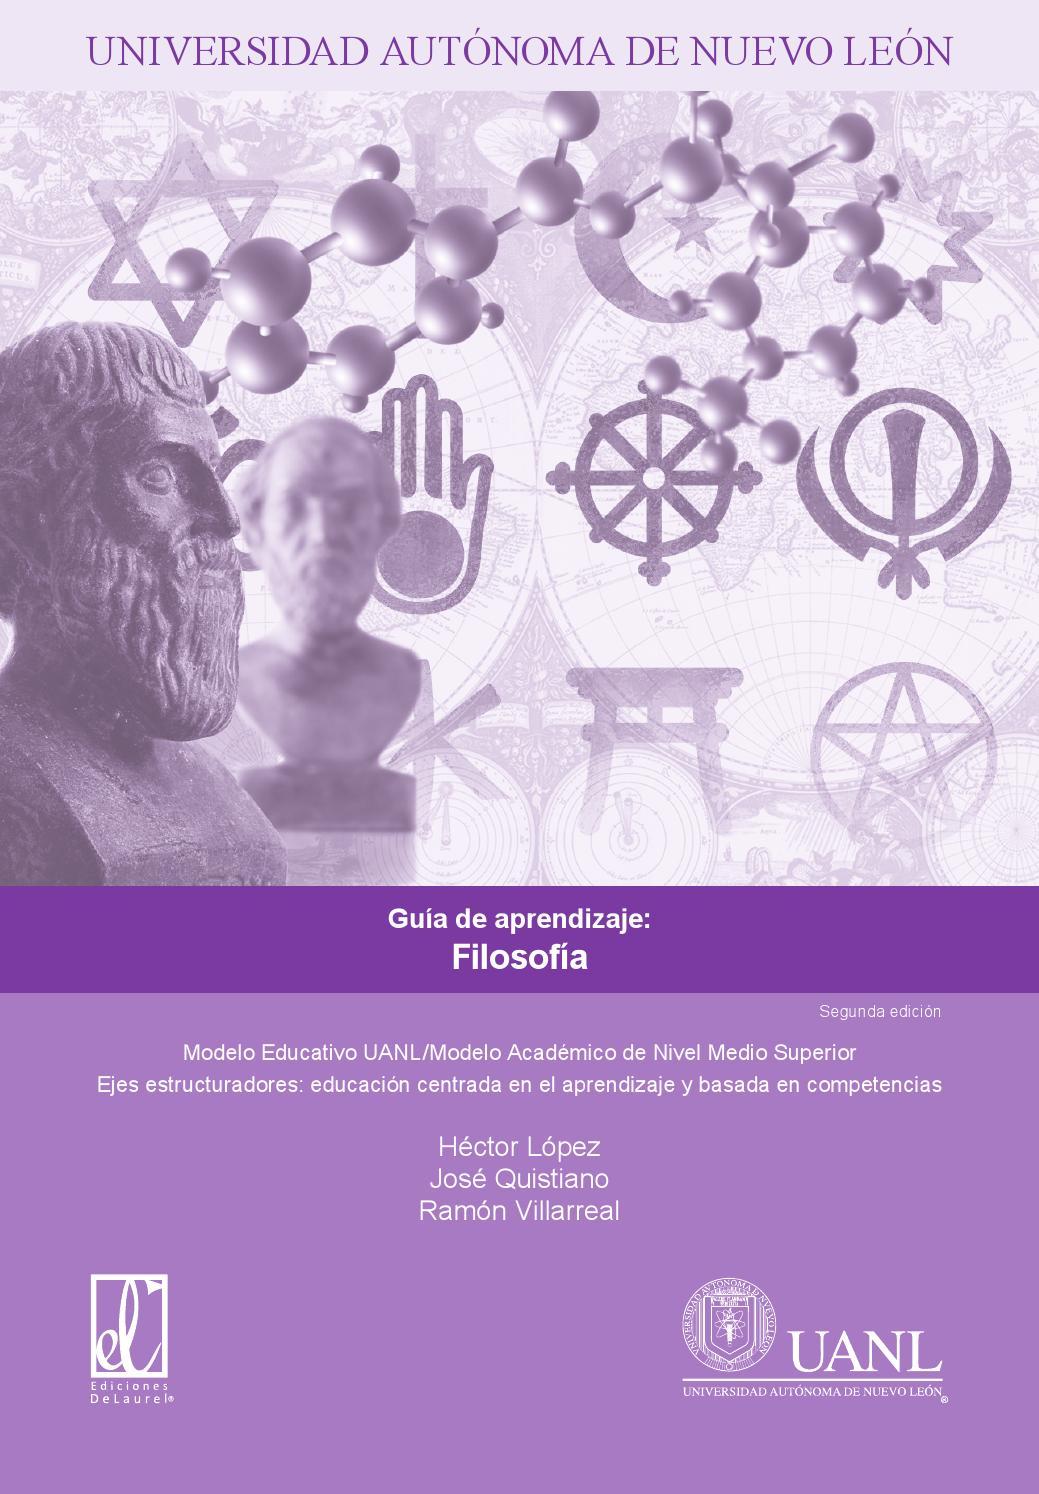 Ga filosofía 2a ed by preparatoria19 - issuu